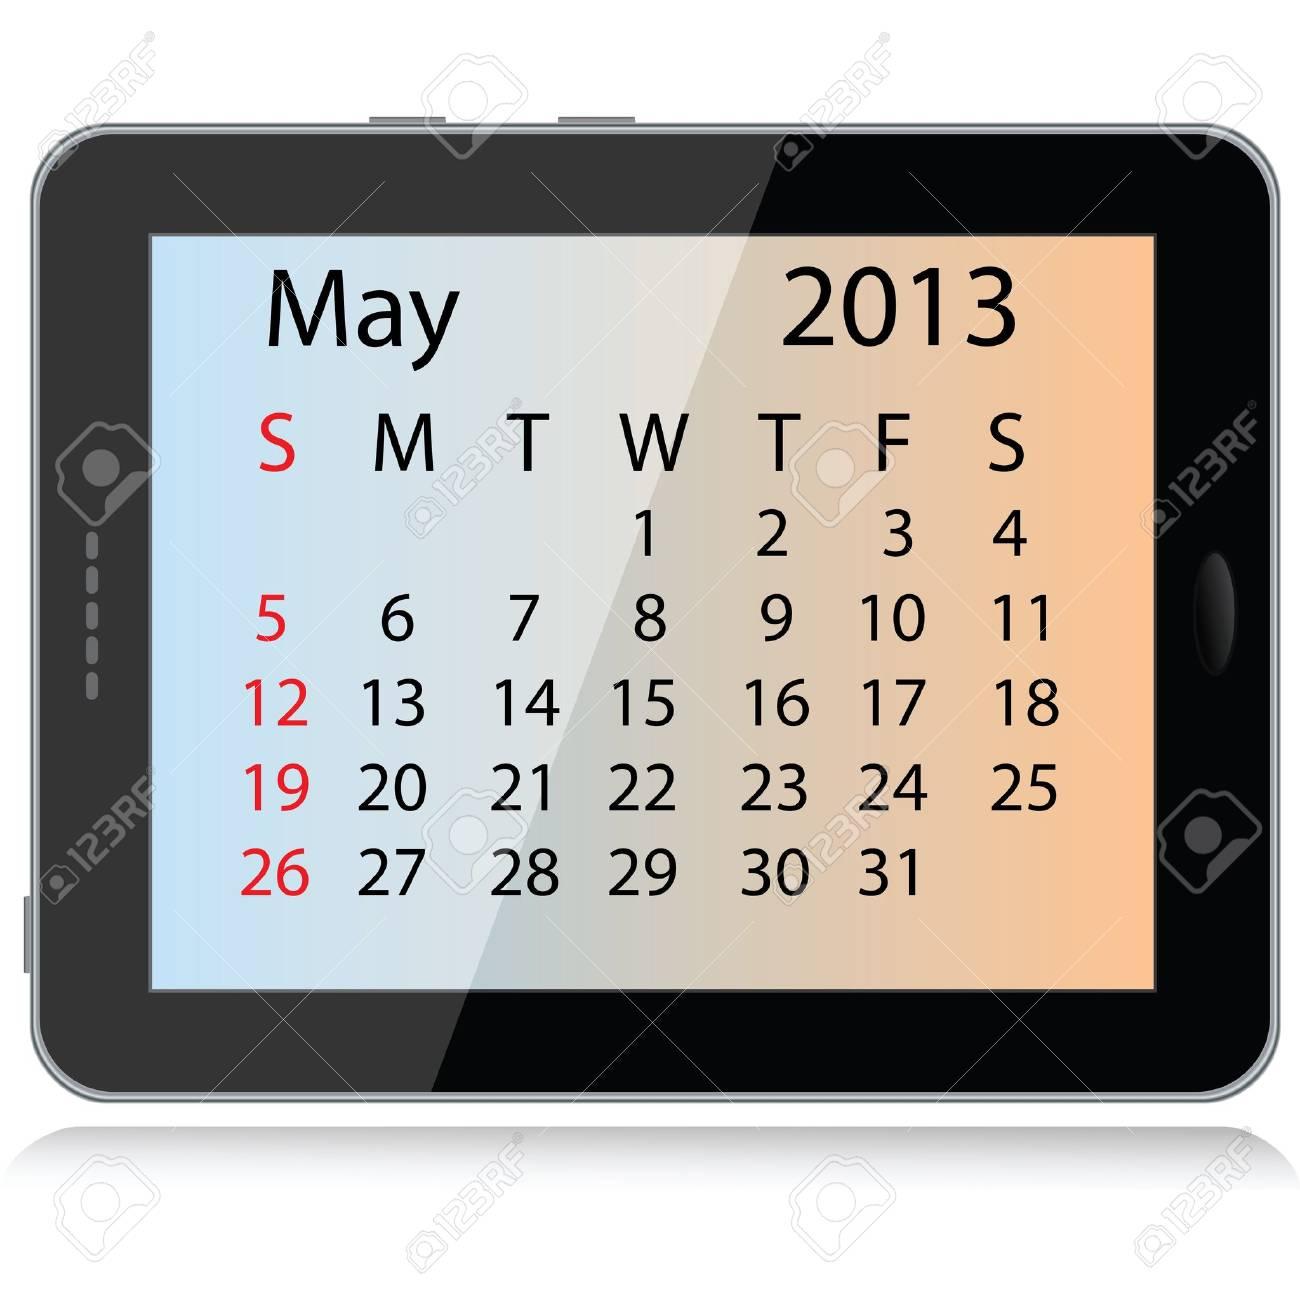 illustration of may 2013 calendar framed in a tablet pc. Stock Vector - 15145804